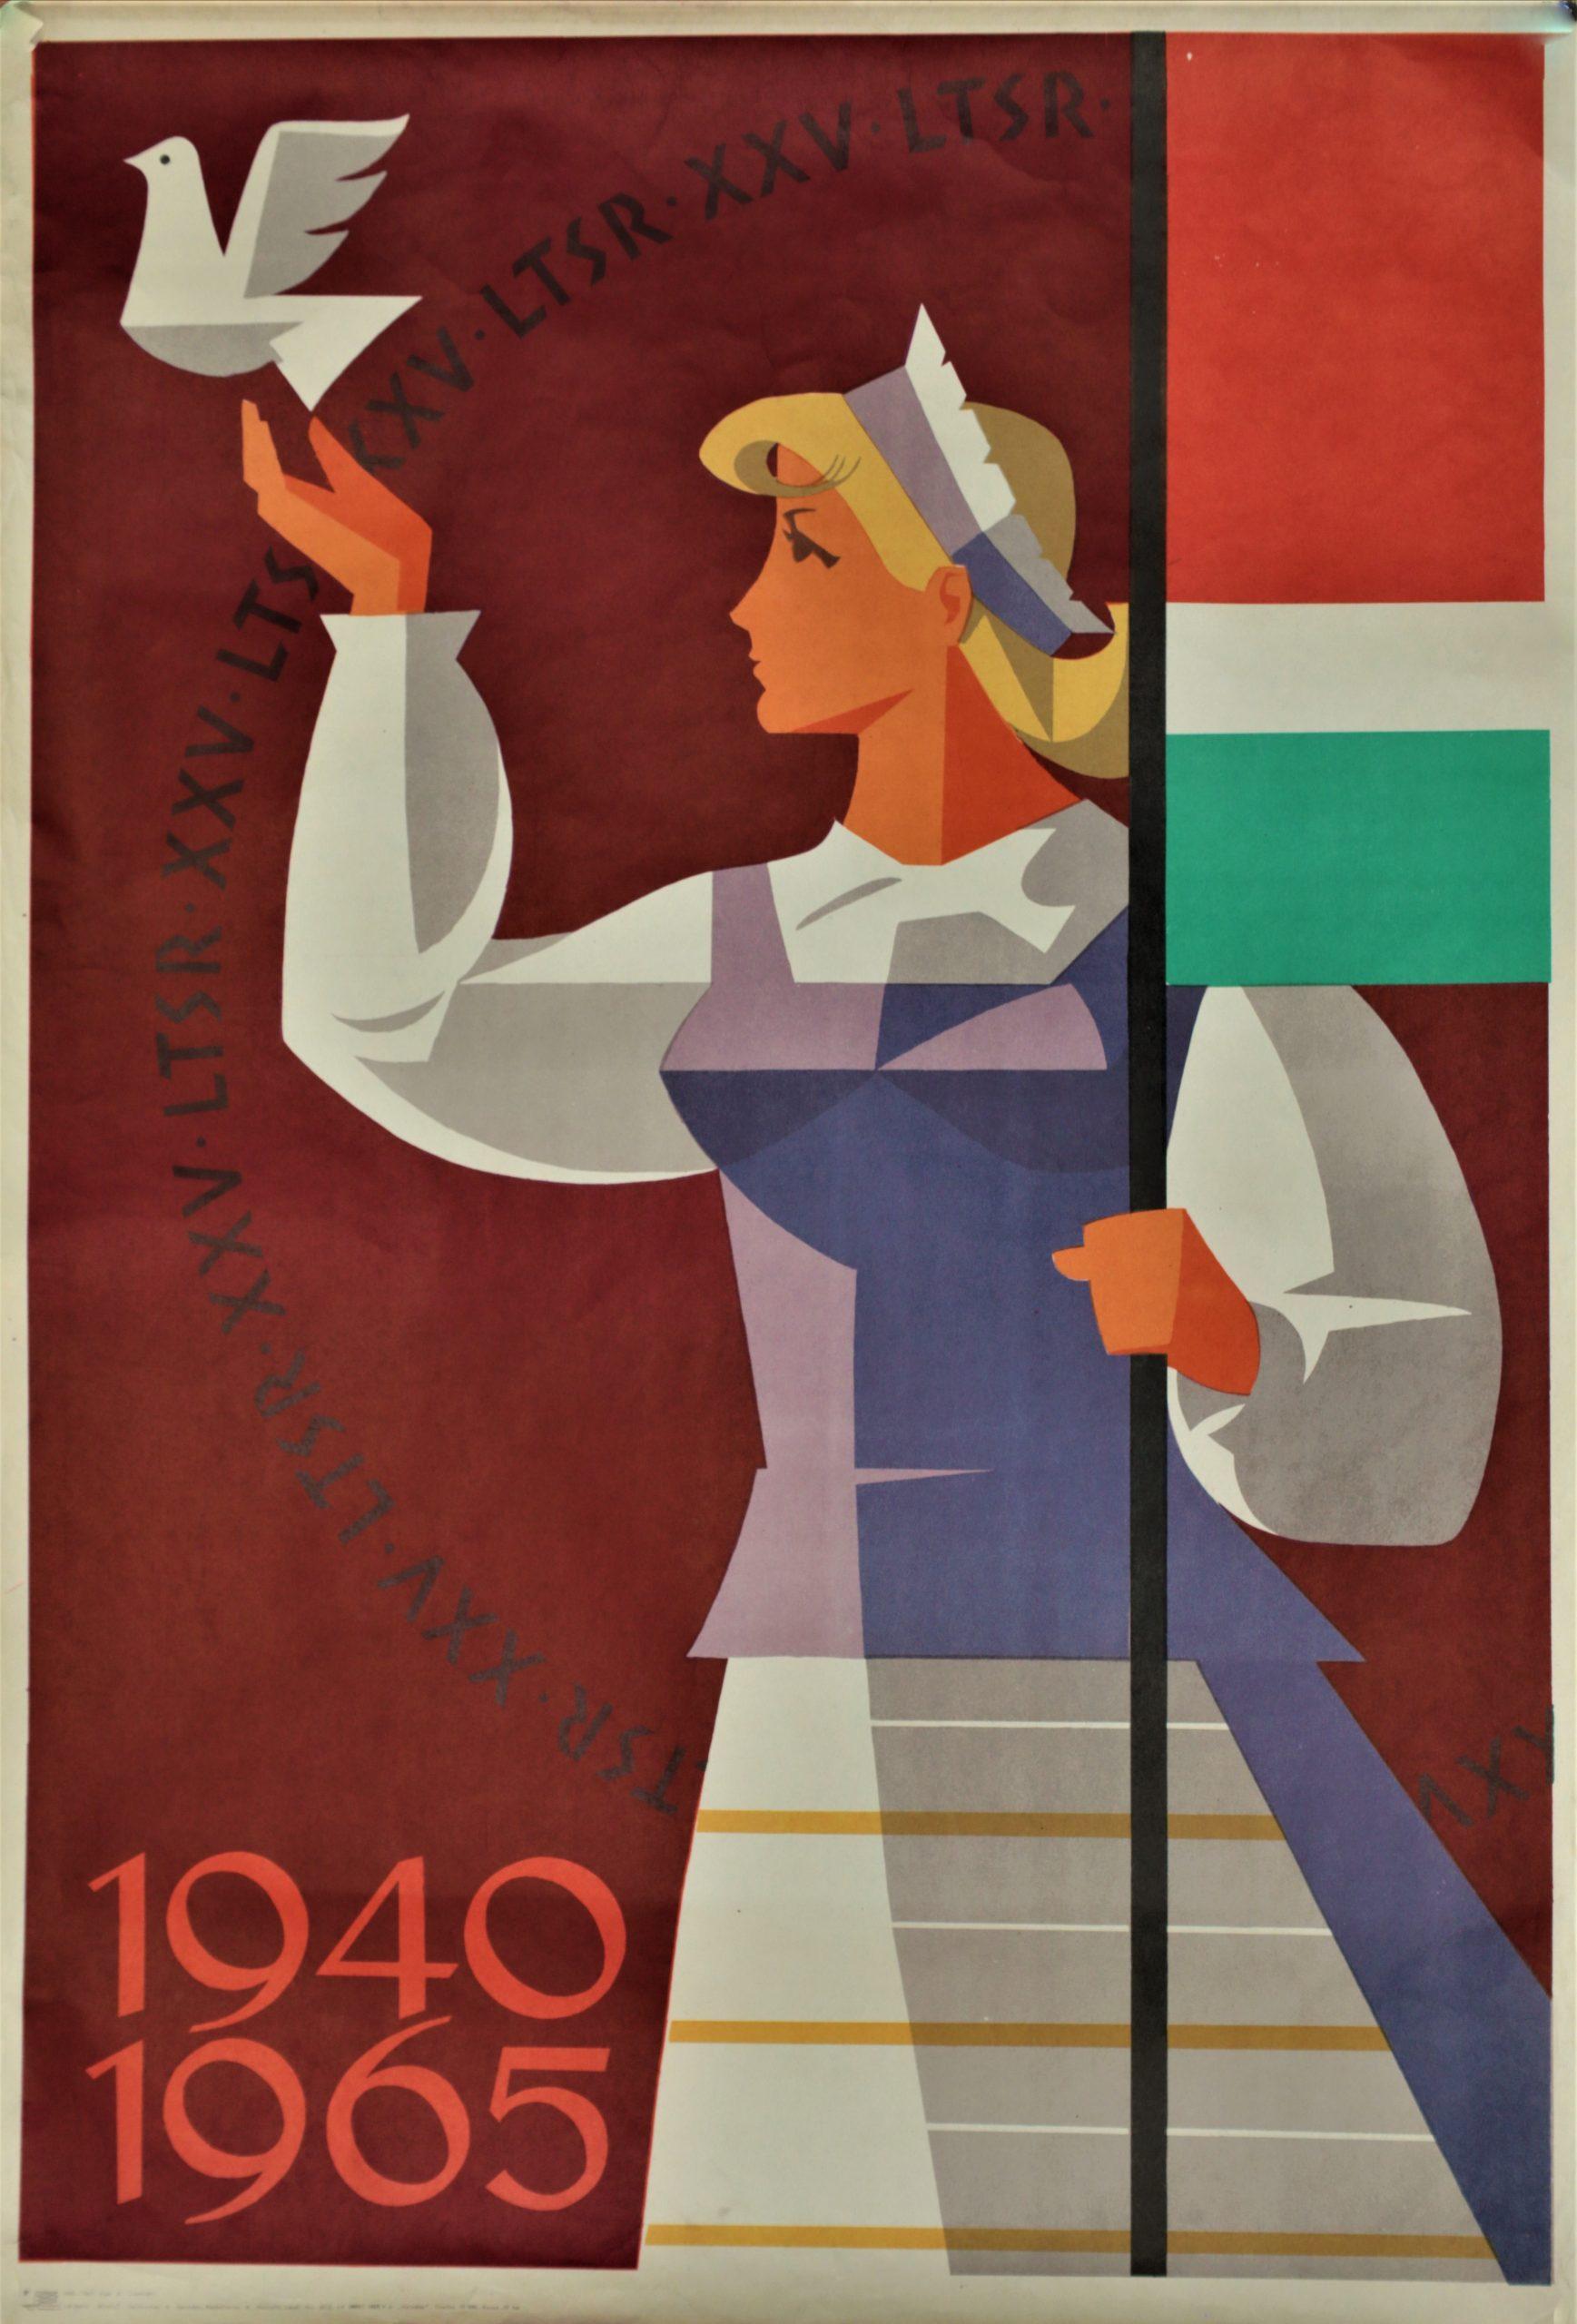 1940–1965, LTSR XXV, plakato dailininkas A. Sprindys, 1965 m.